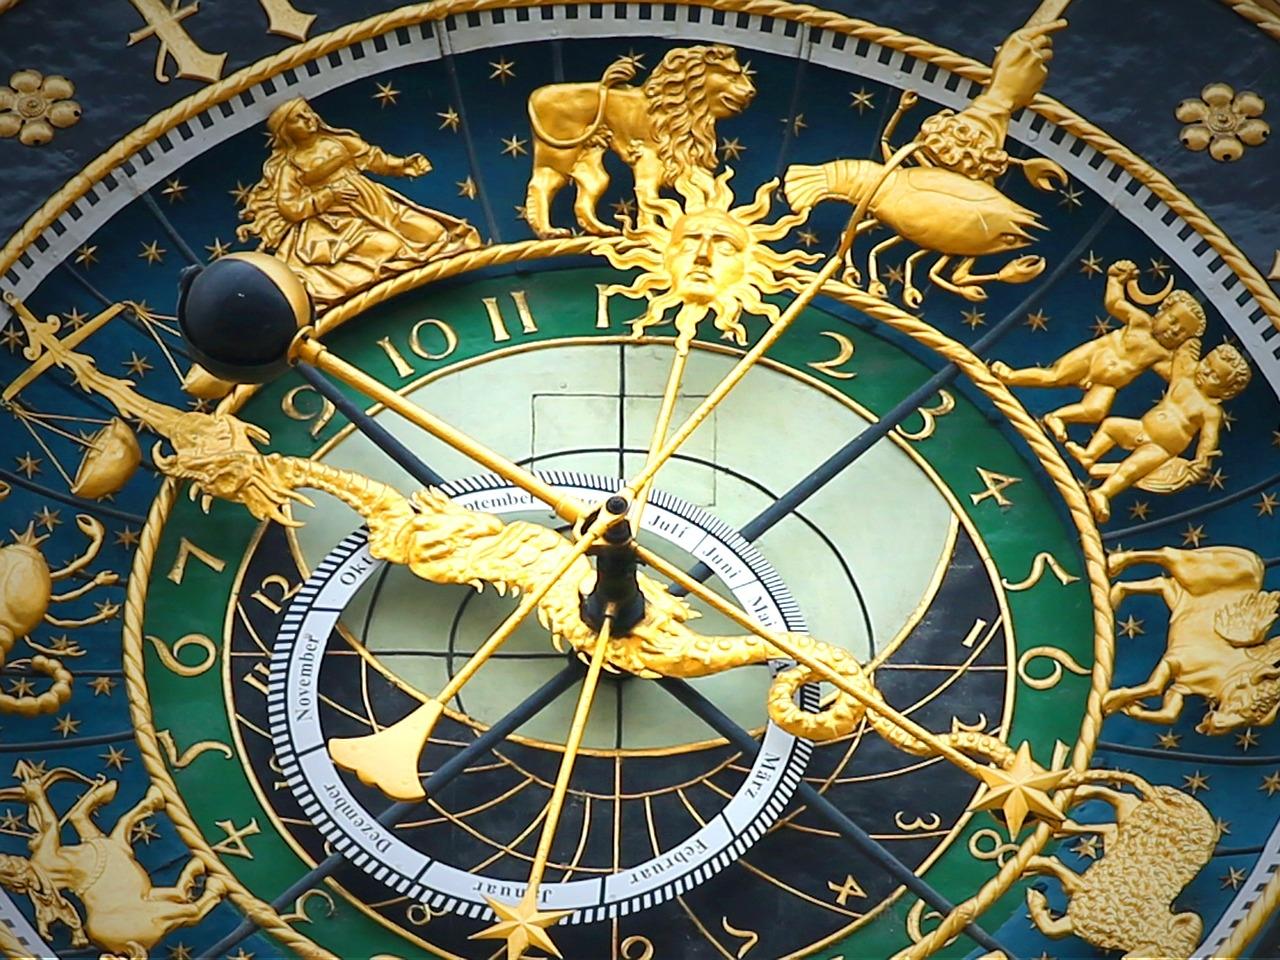 Tα ζώδια σήμερα 10 Μαρτίου: Ιχθείς, η θέση της Σελήνης φέρνει ανατροπές